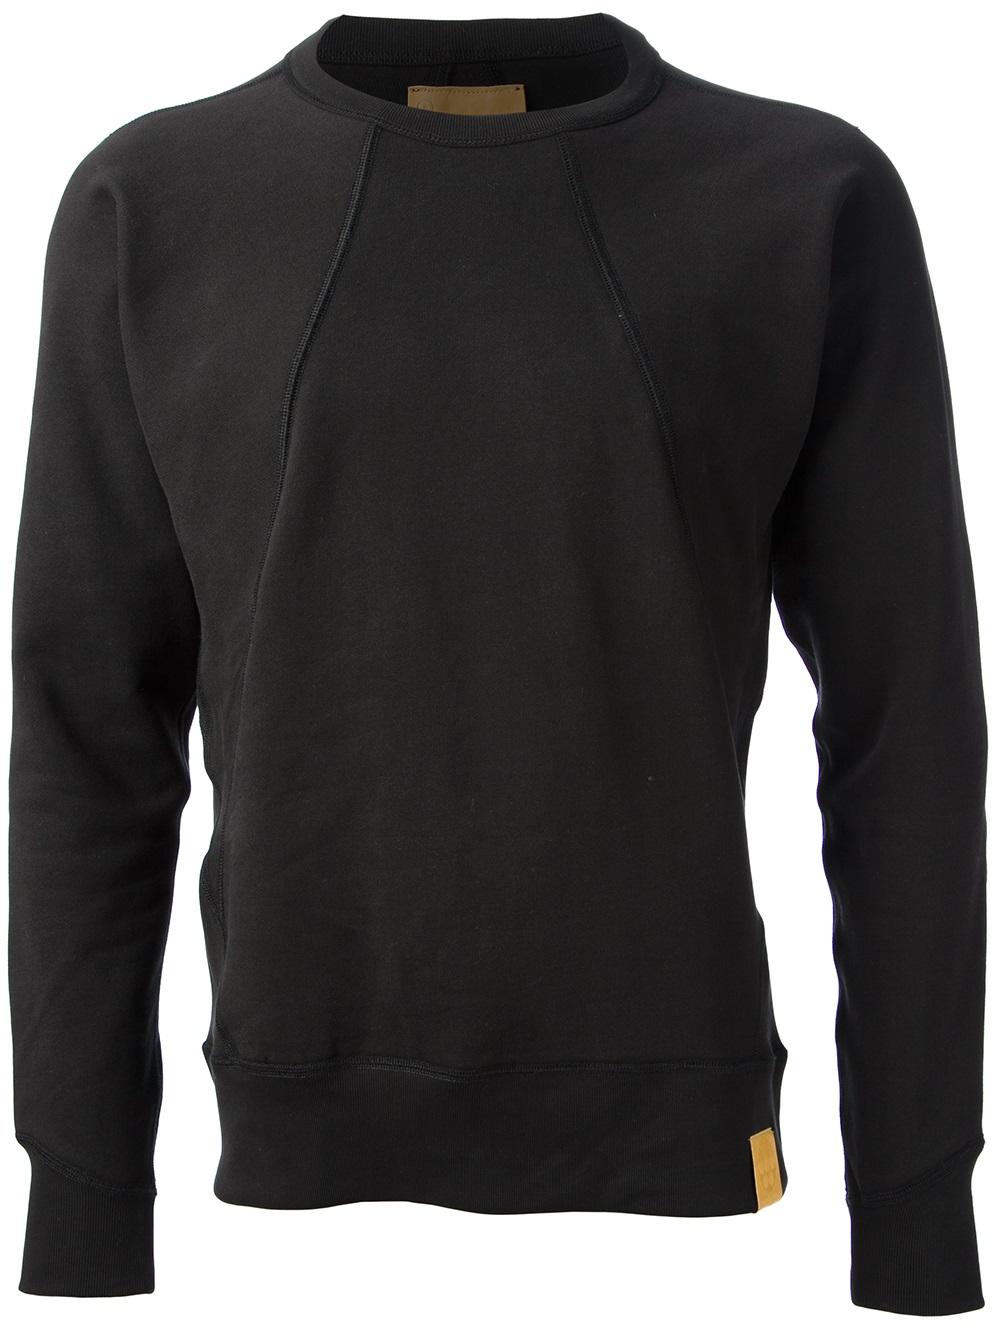 g star raw slim fit sweater in black for men lyst. Black Bedroom Furniture Sets. Home Design Ideas